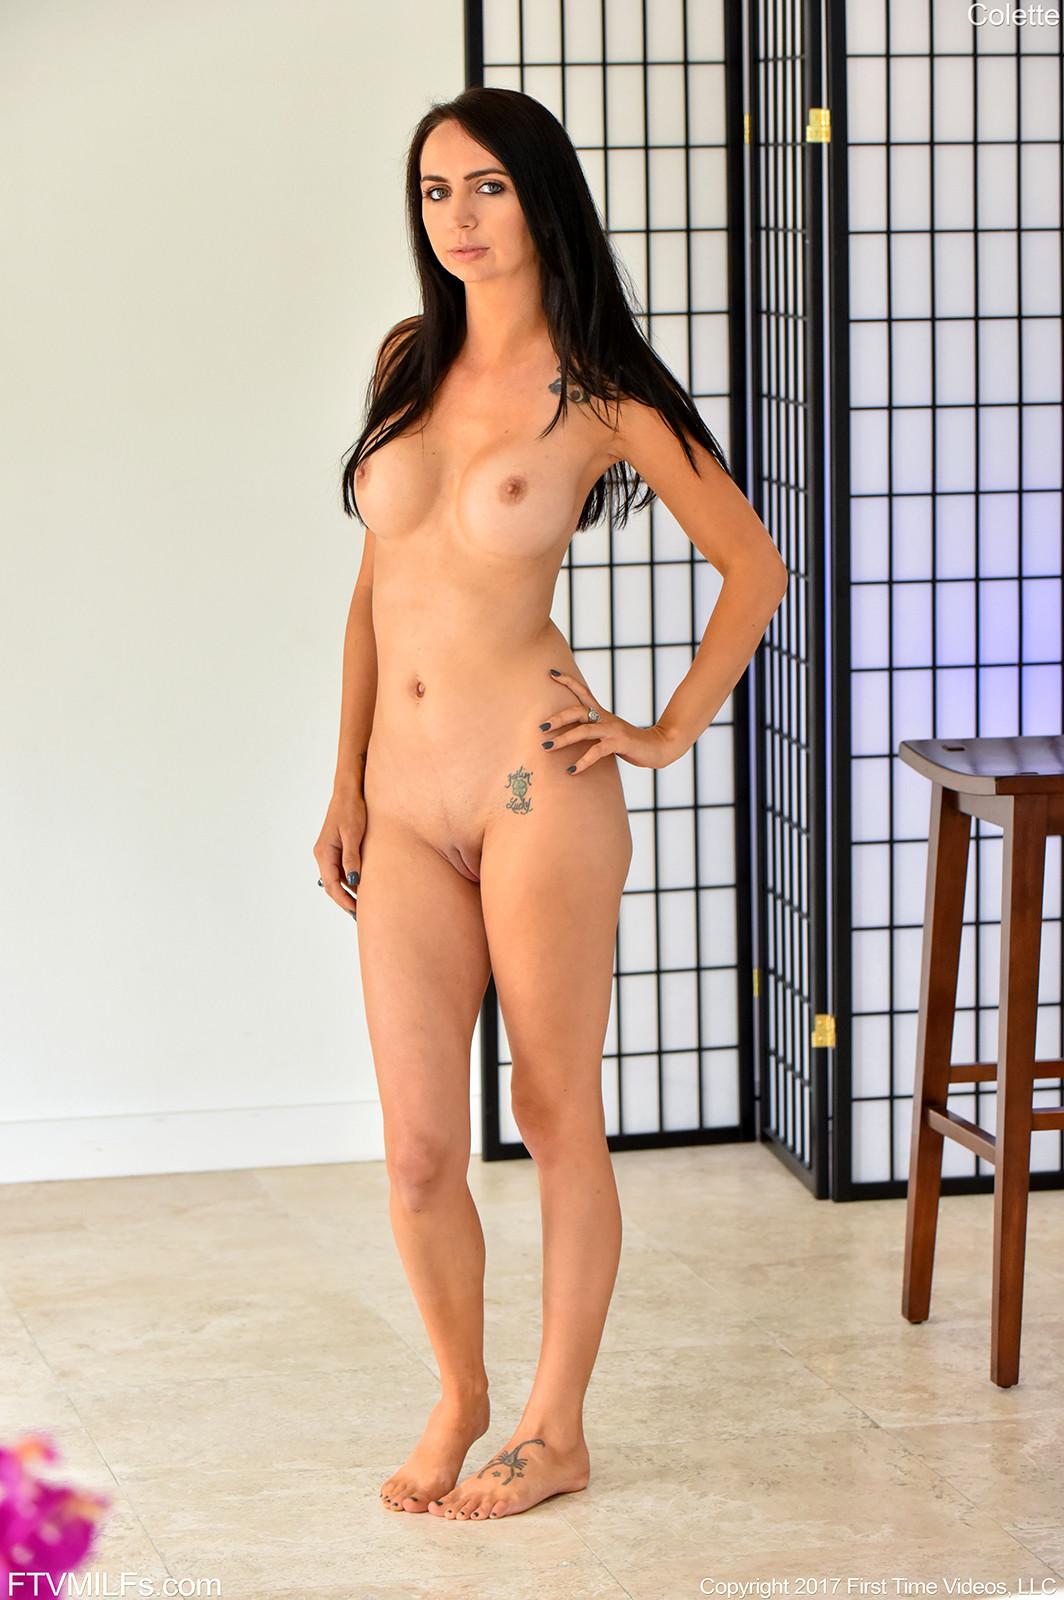 Babe Today Ftv Girls Colette Adams Regular Nude Posing -5674